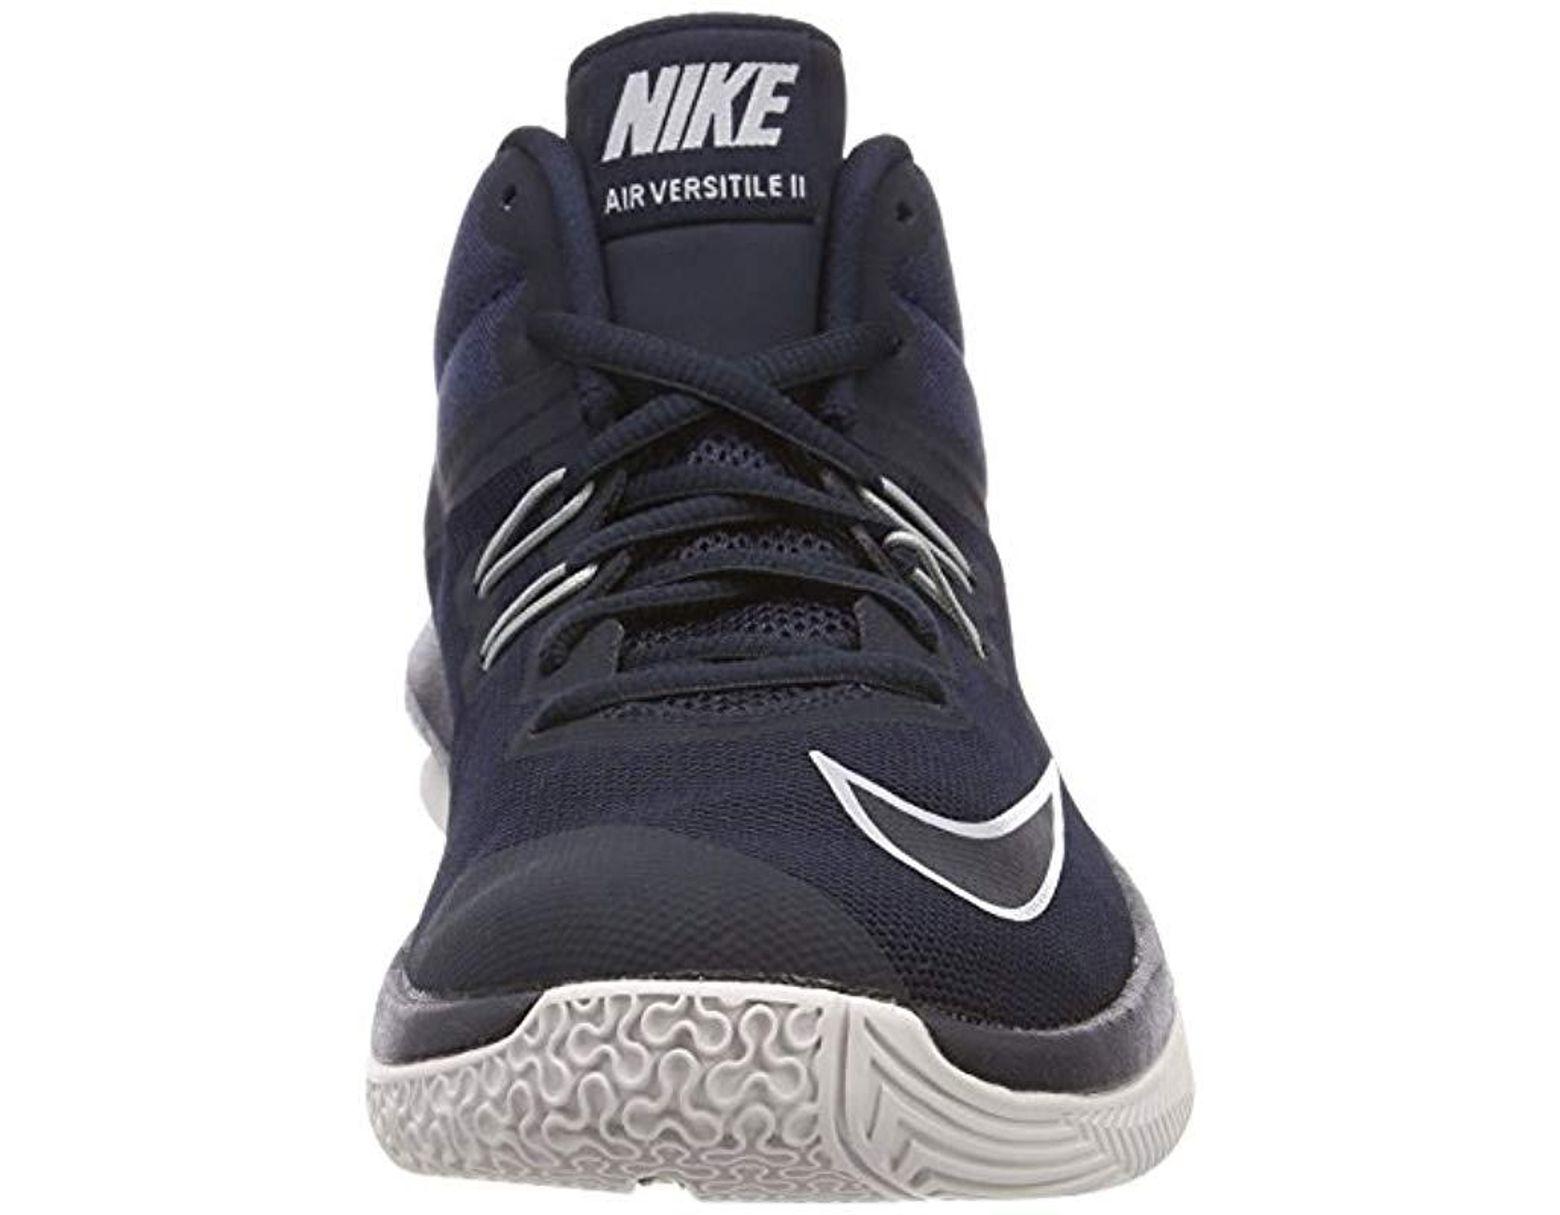 f080b148dbdc8 Men's Gray Air Versitile Ii Basketball Shoes